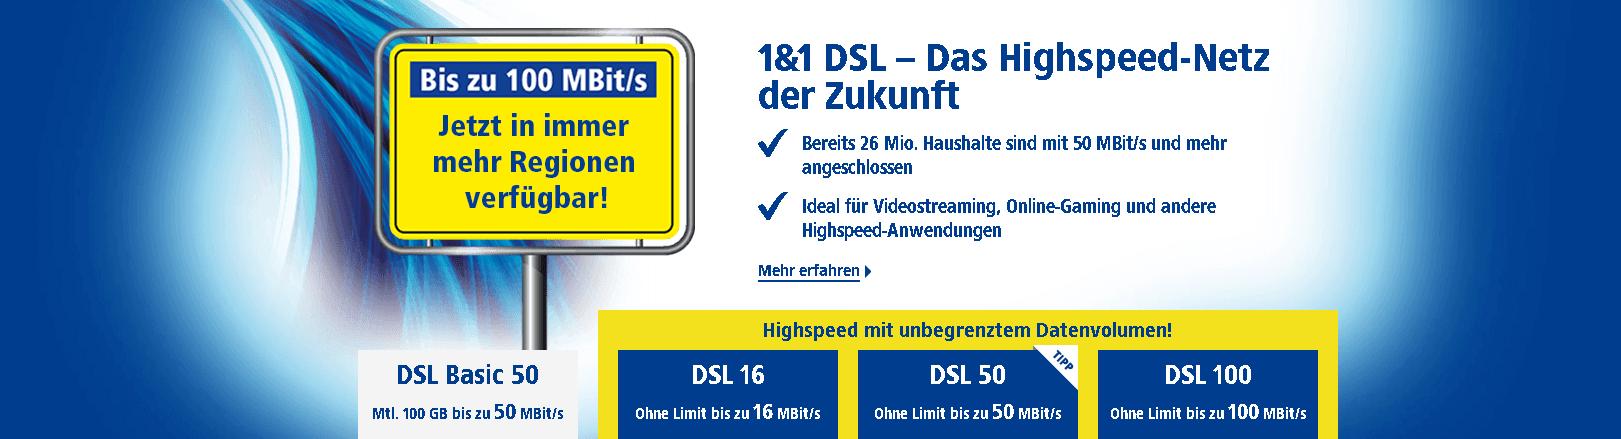 DSL-100